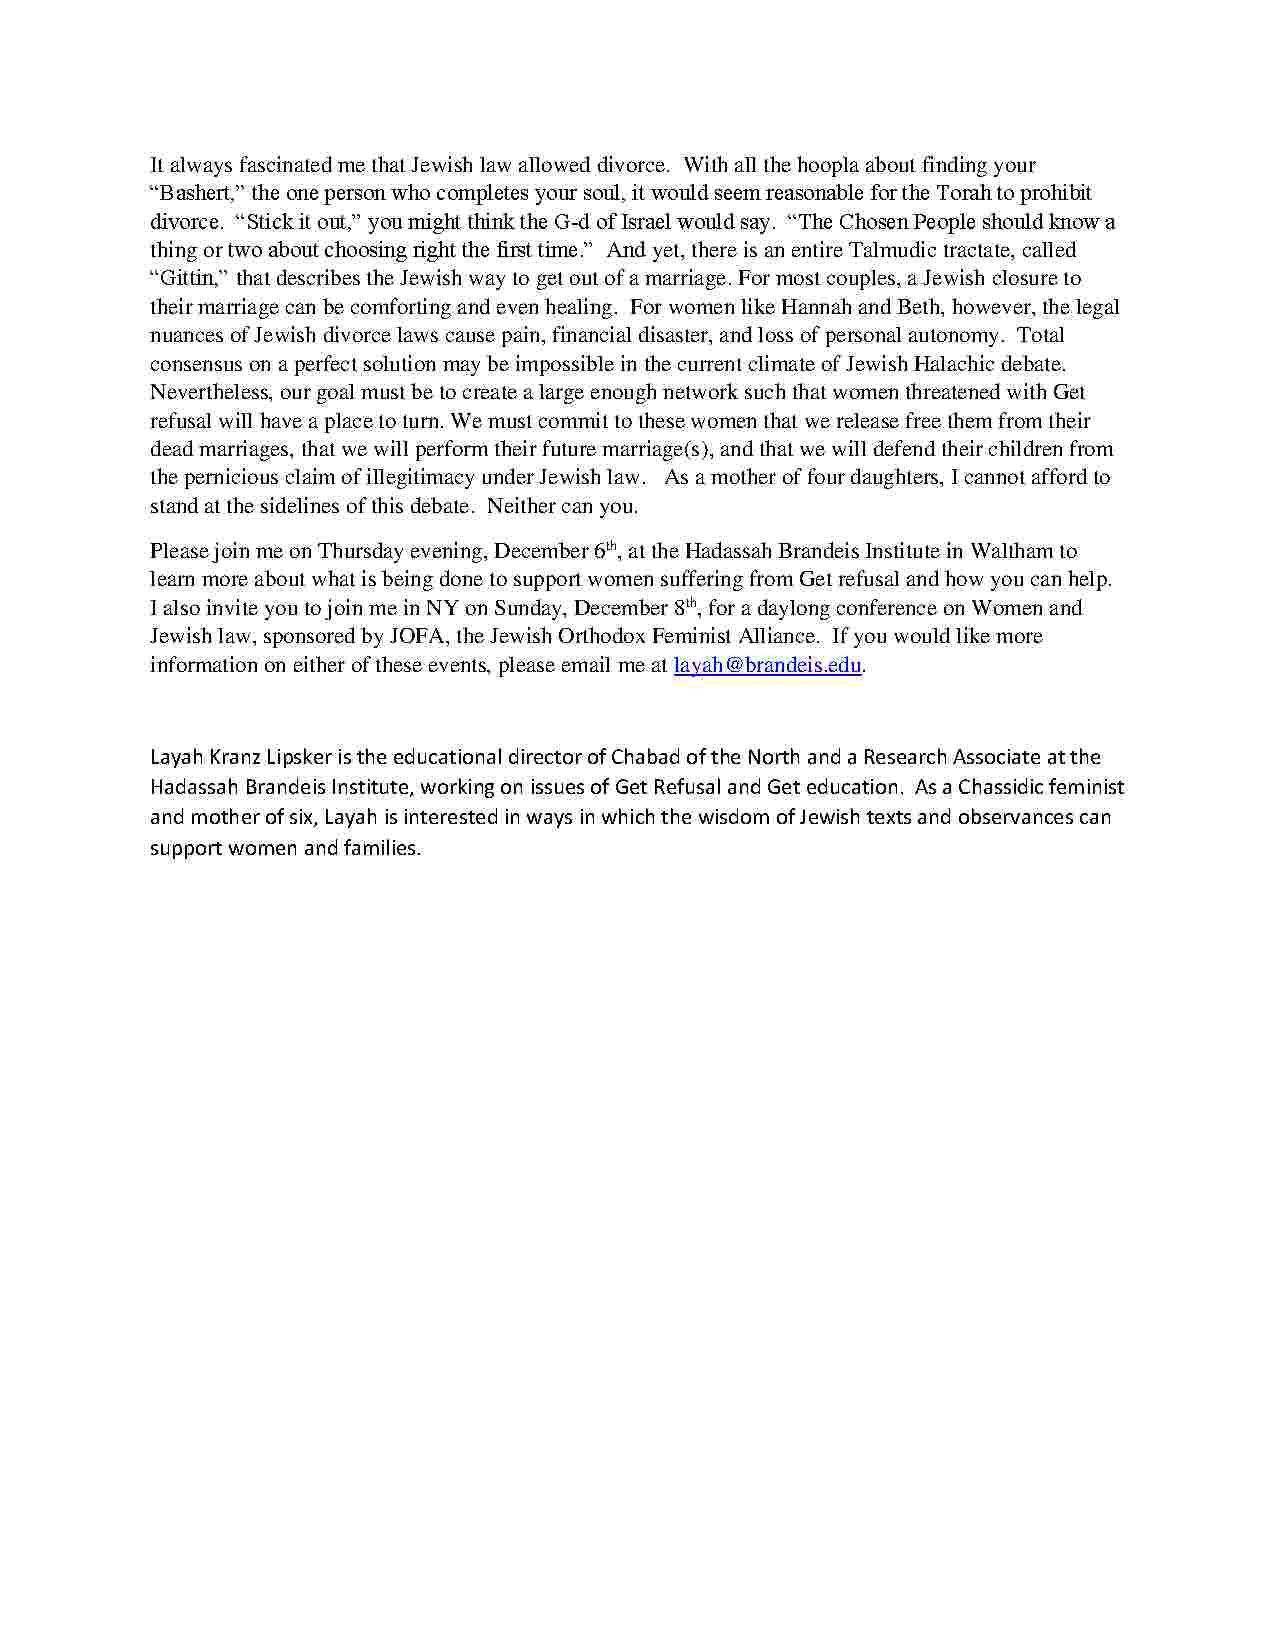 Development of periodical essay